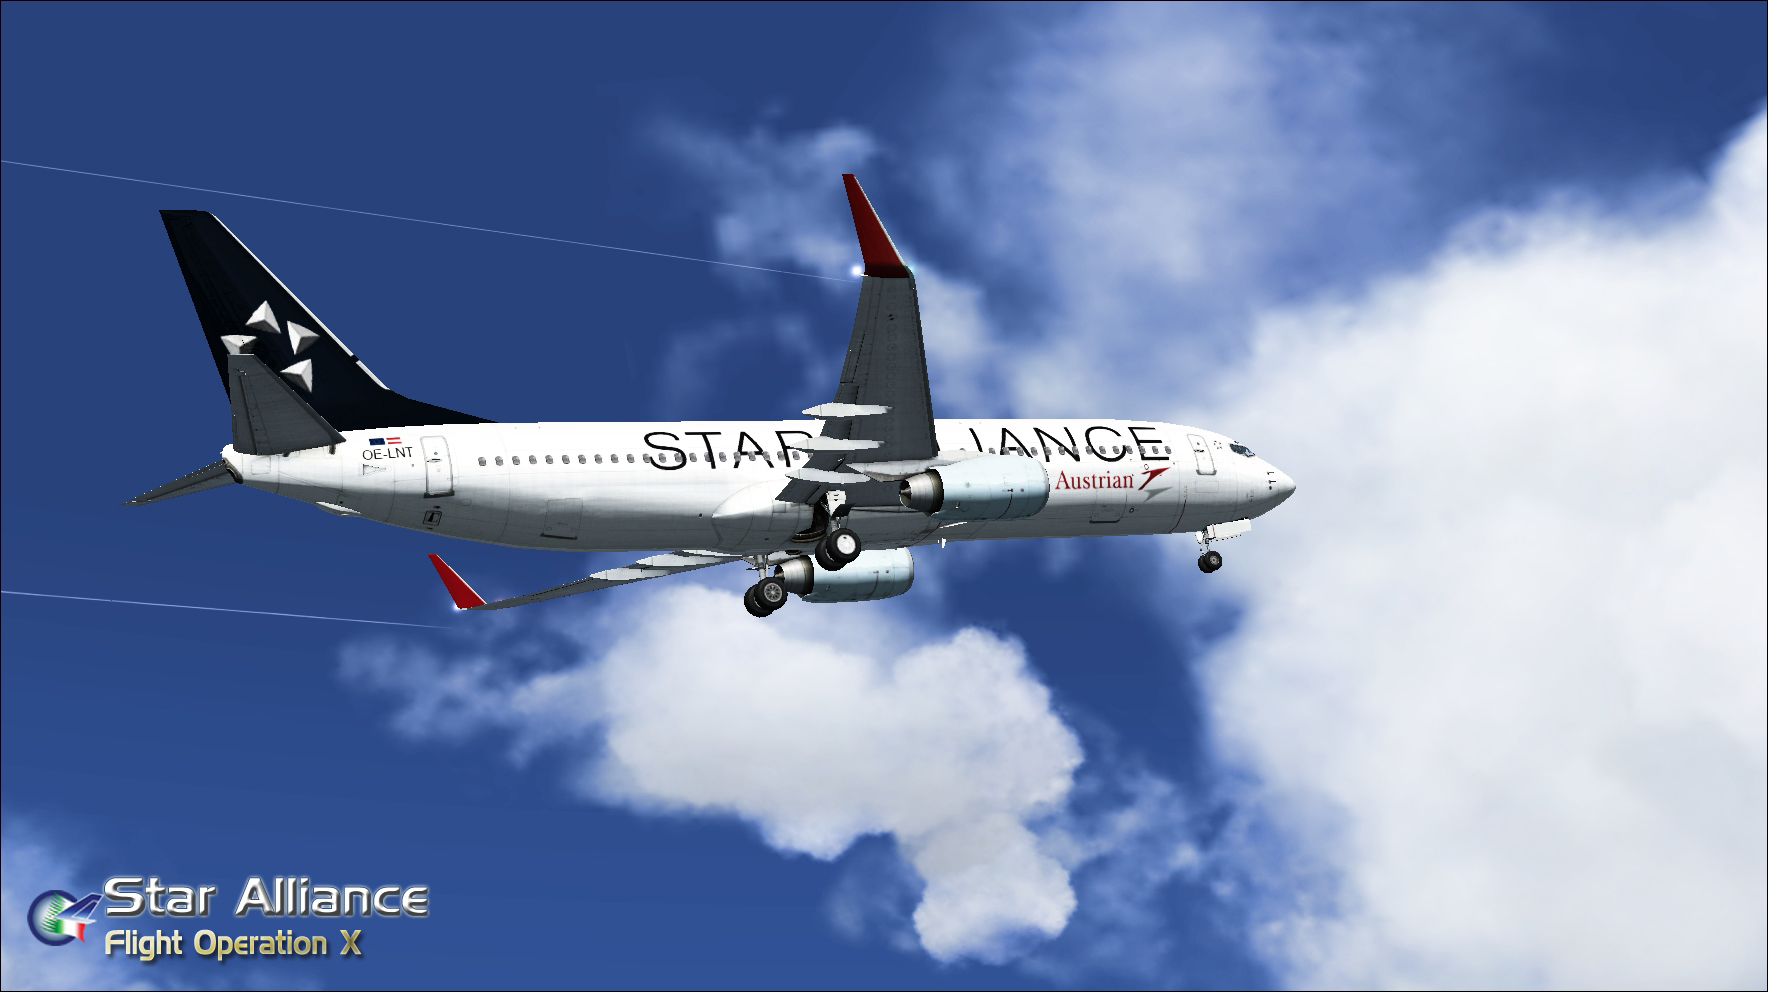 Perfect Flight - Flight Operation X Star Alliance